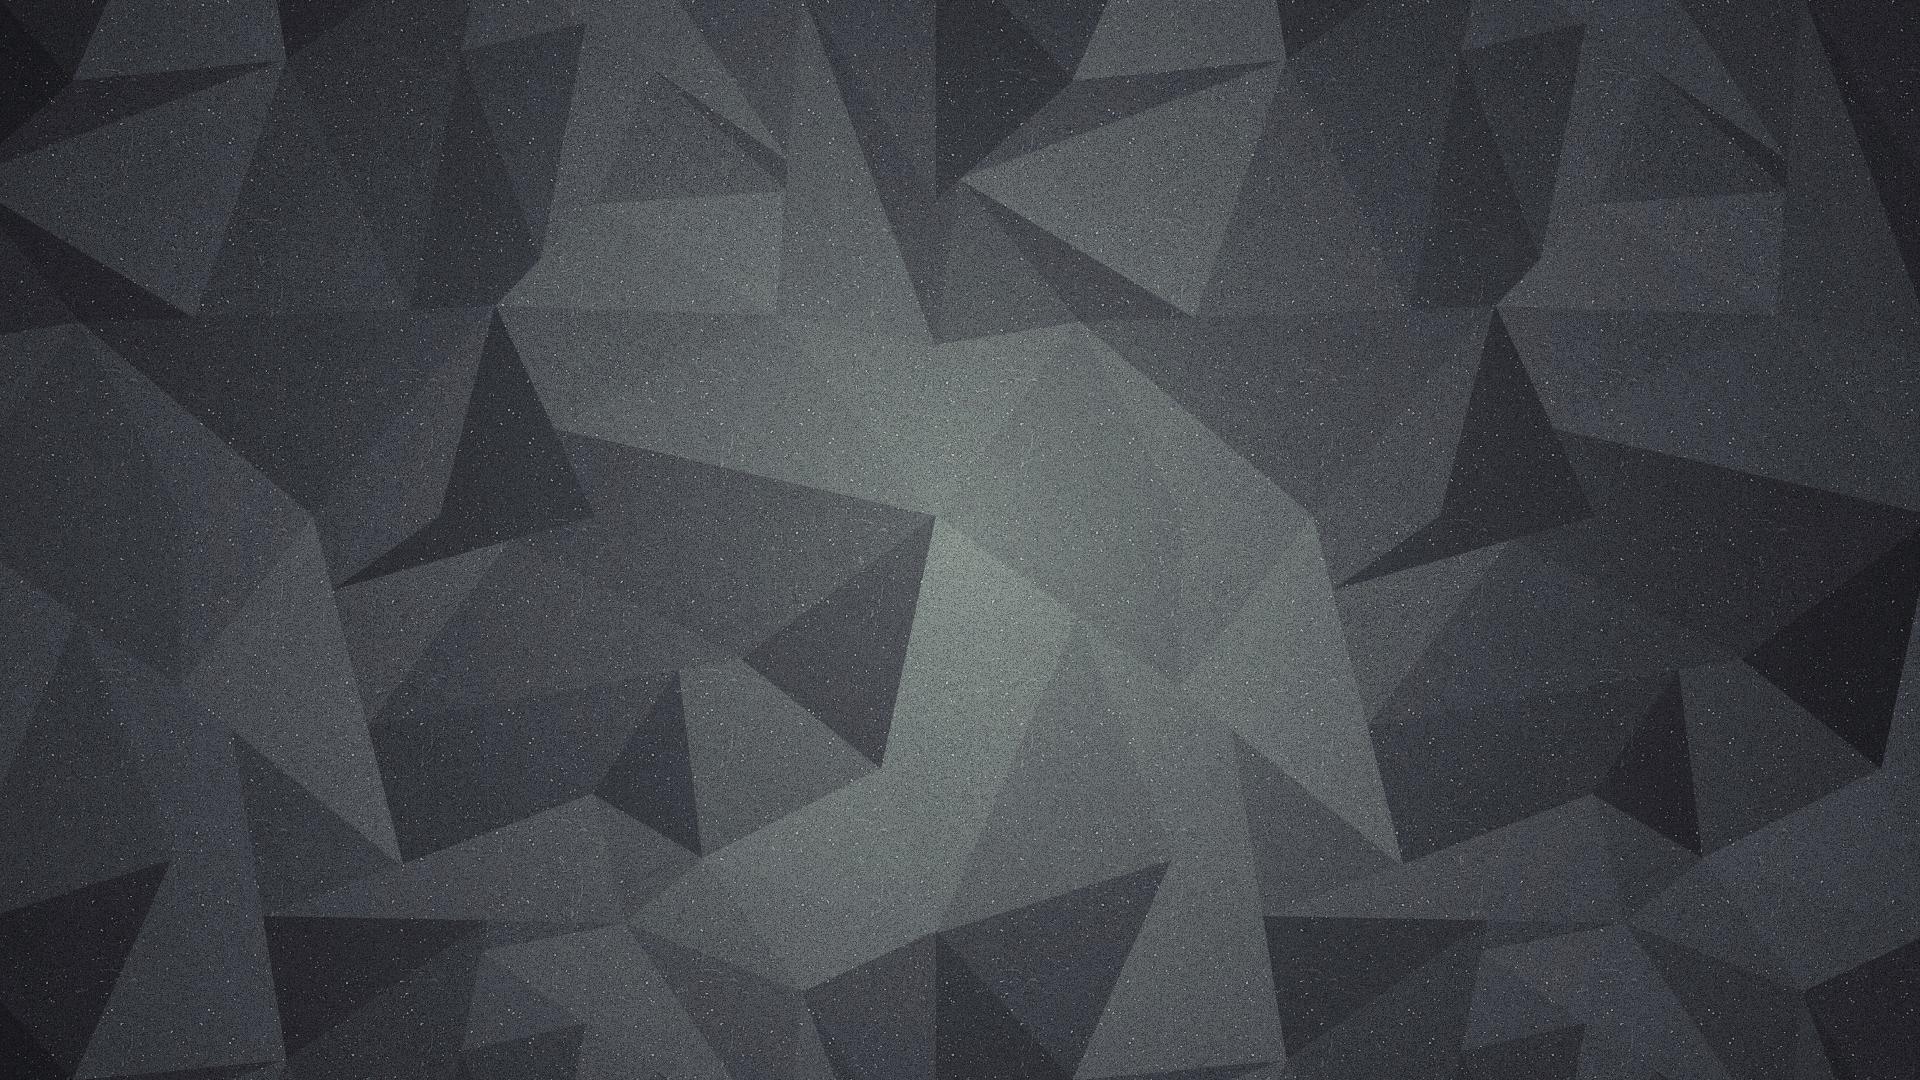 wallpaper.wiki-Free-black-and-grey-geometric-wallpaper-